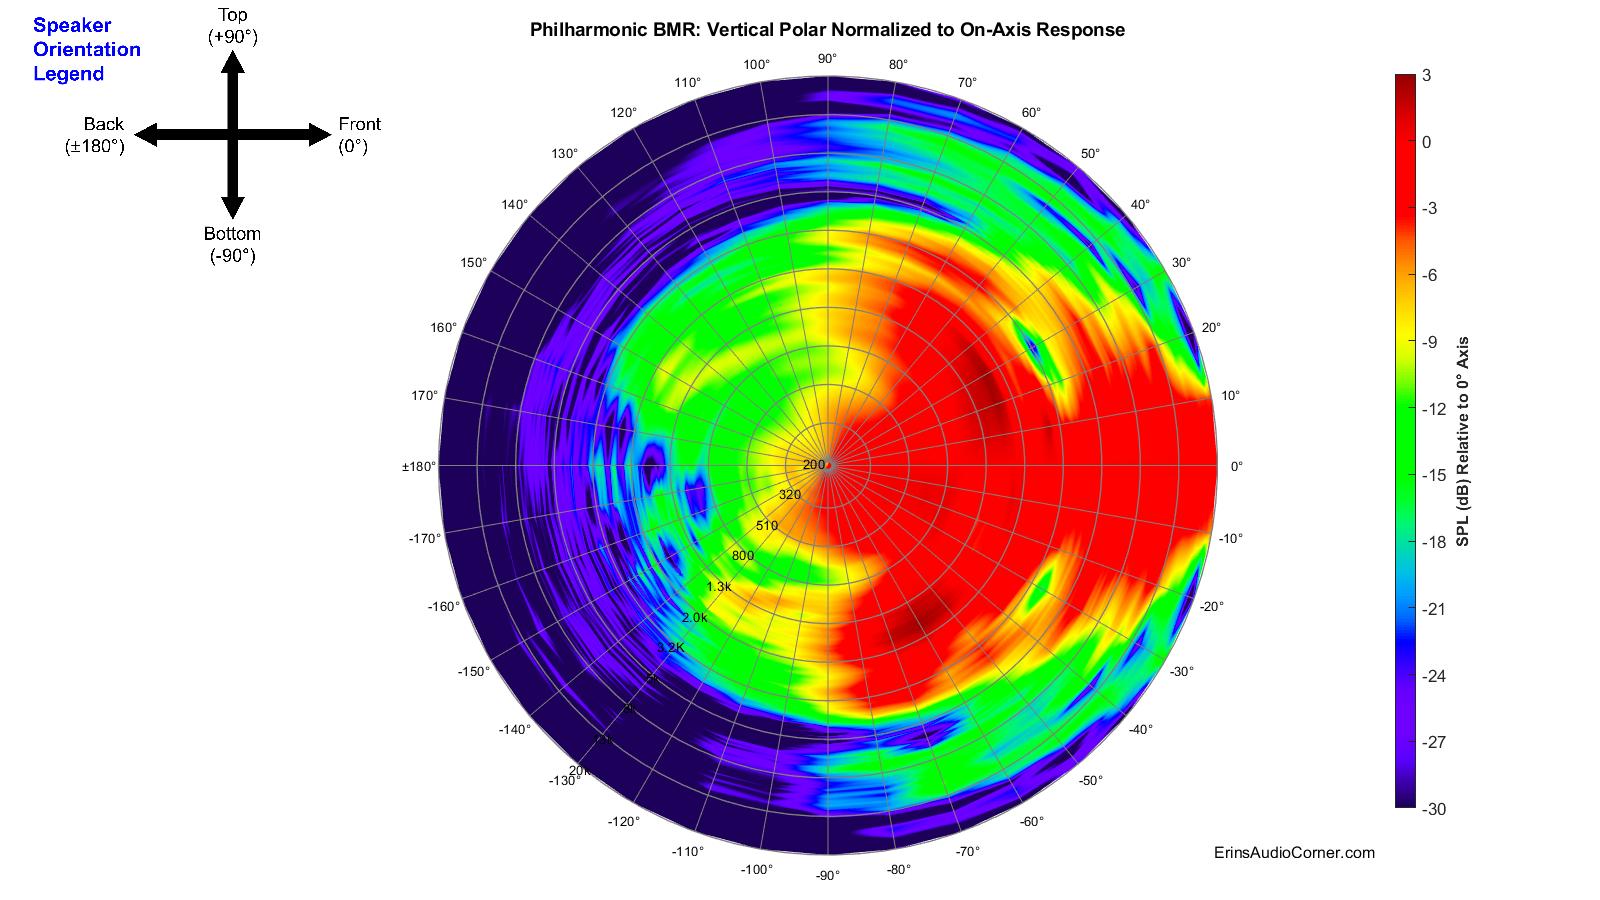 Philharmonic%20BMR_360_Vertical_Polar_Normalized.png